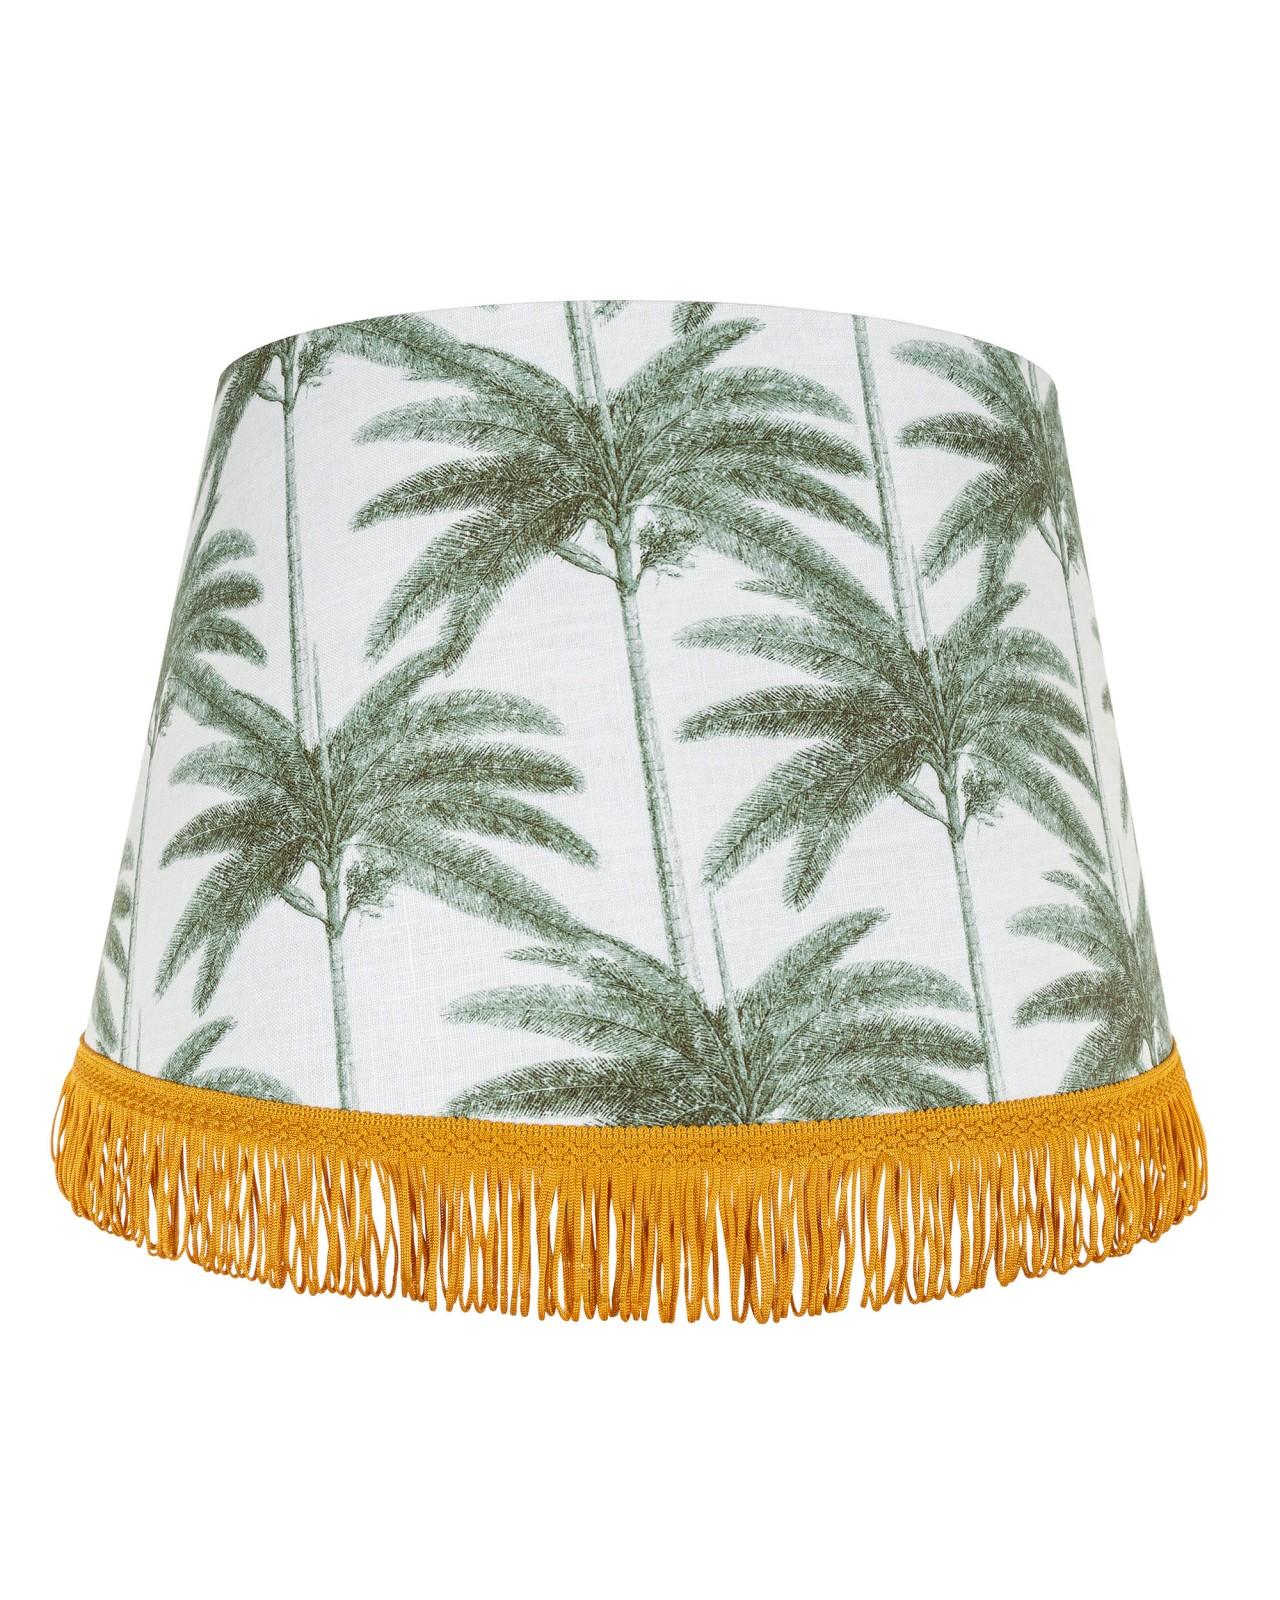 ORNAMENTAL PALMS KALASH Table Lamp